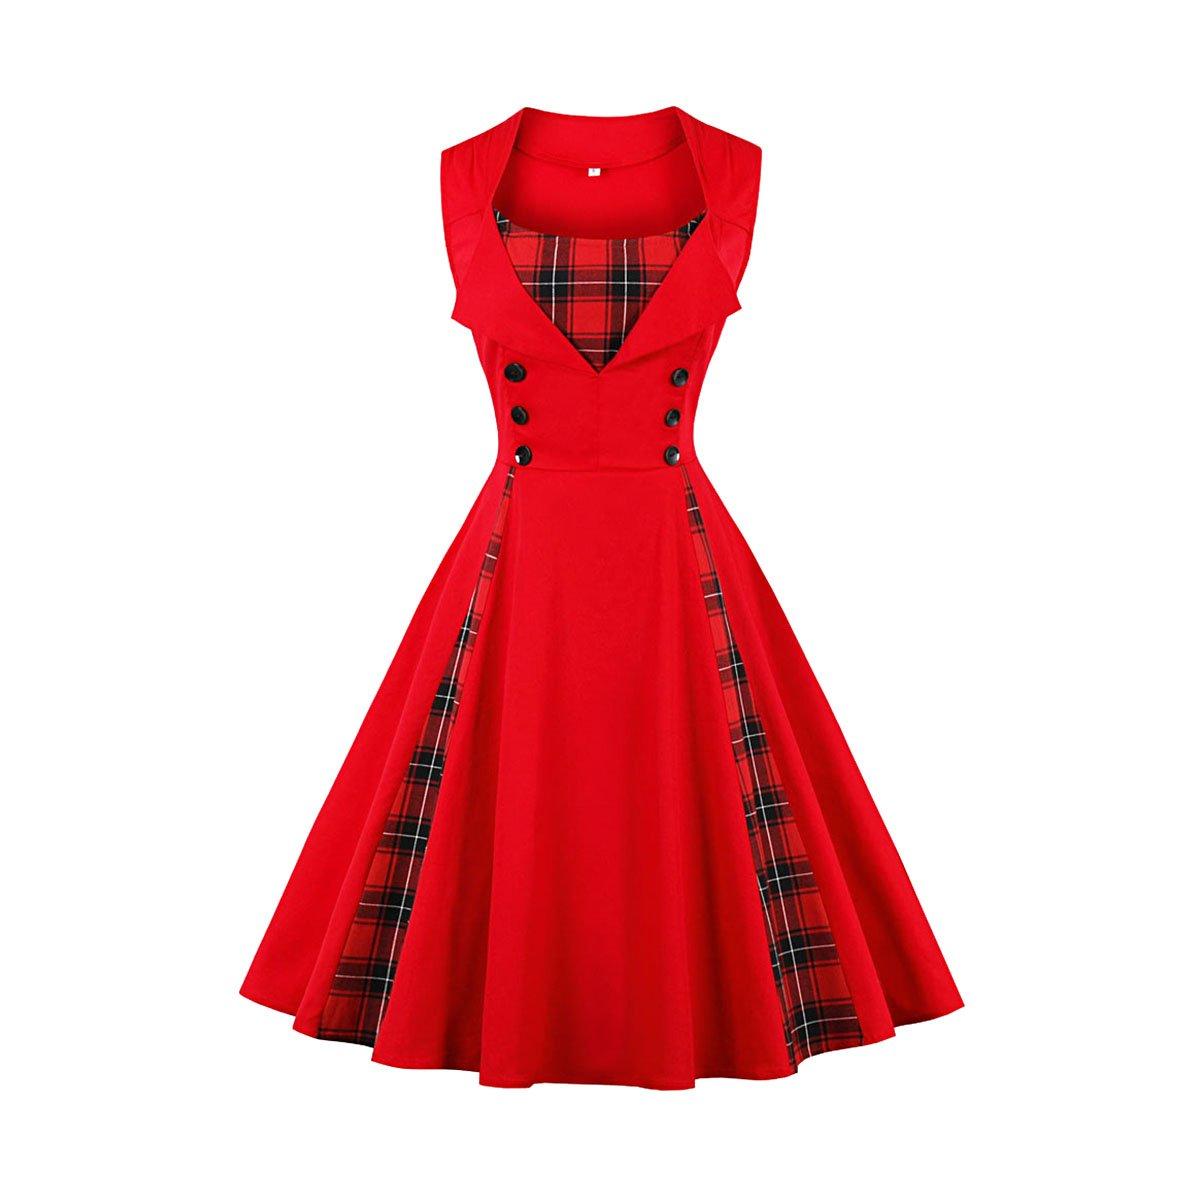 Women Patchwork Plaid Button Decoration Skirt Vintage 1950s Party Midi Swing Dress QiuLan